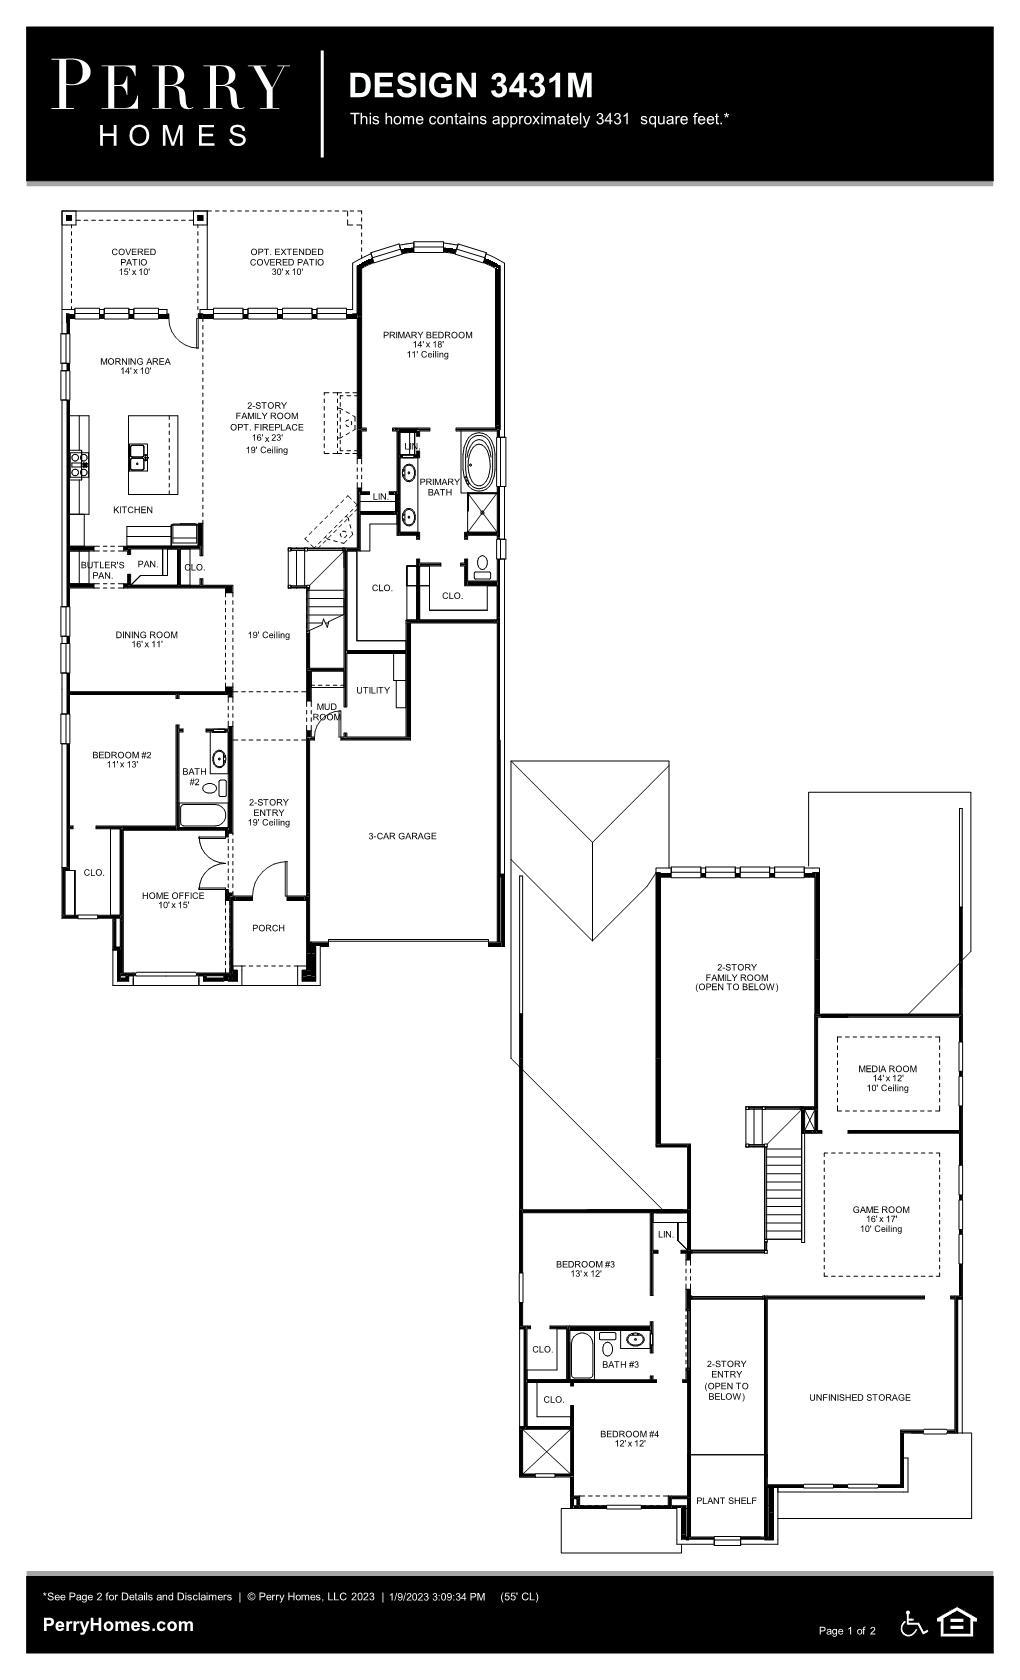 Floor Plan for 3431M